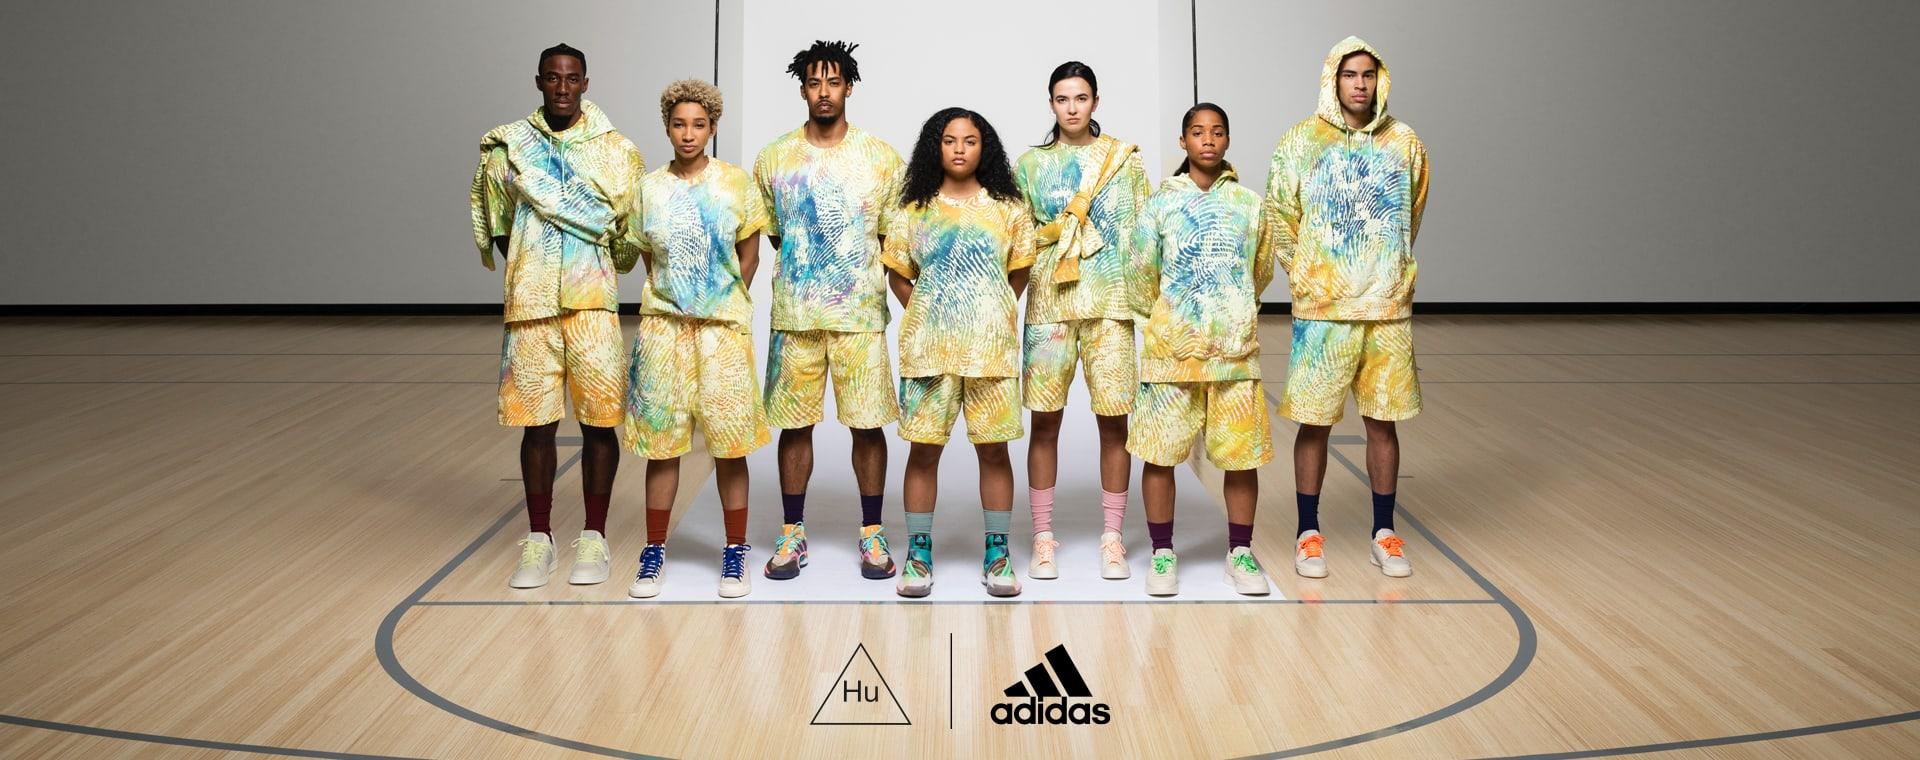 Adidas Online Shop | adidas NO